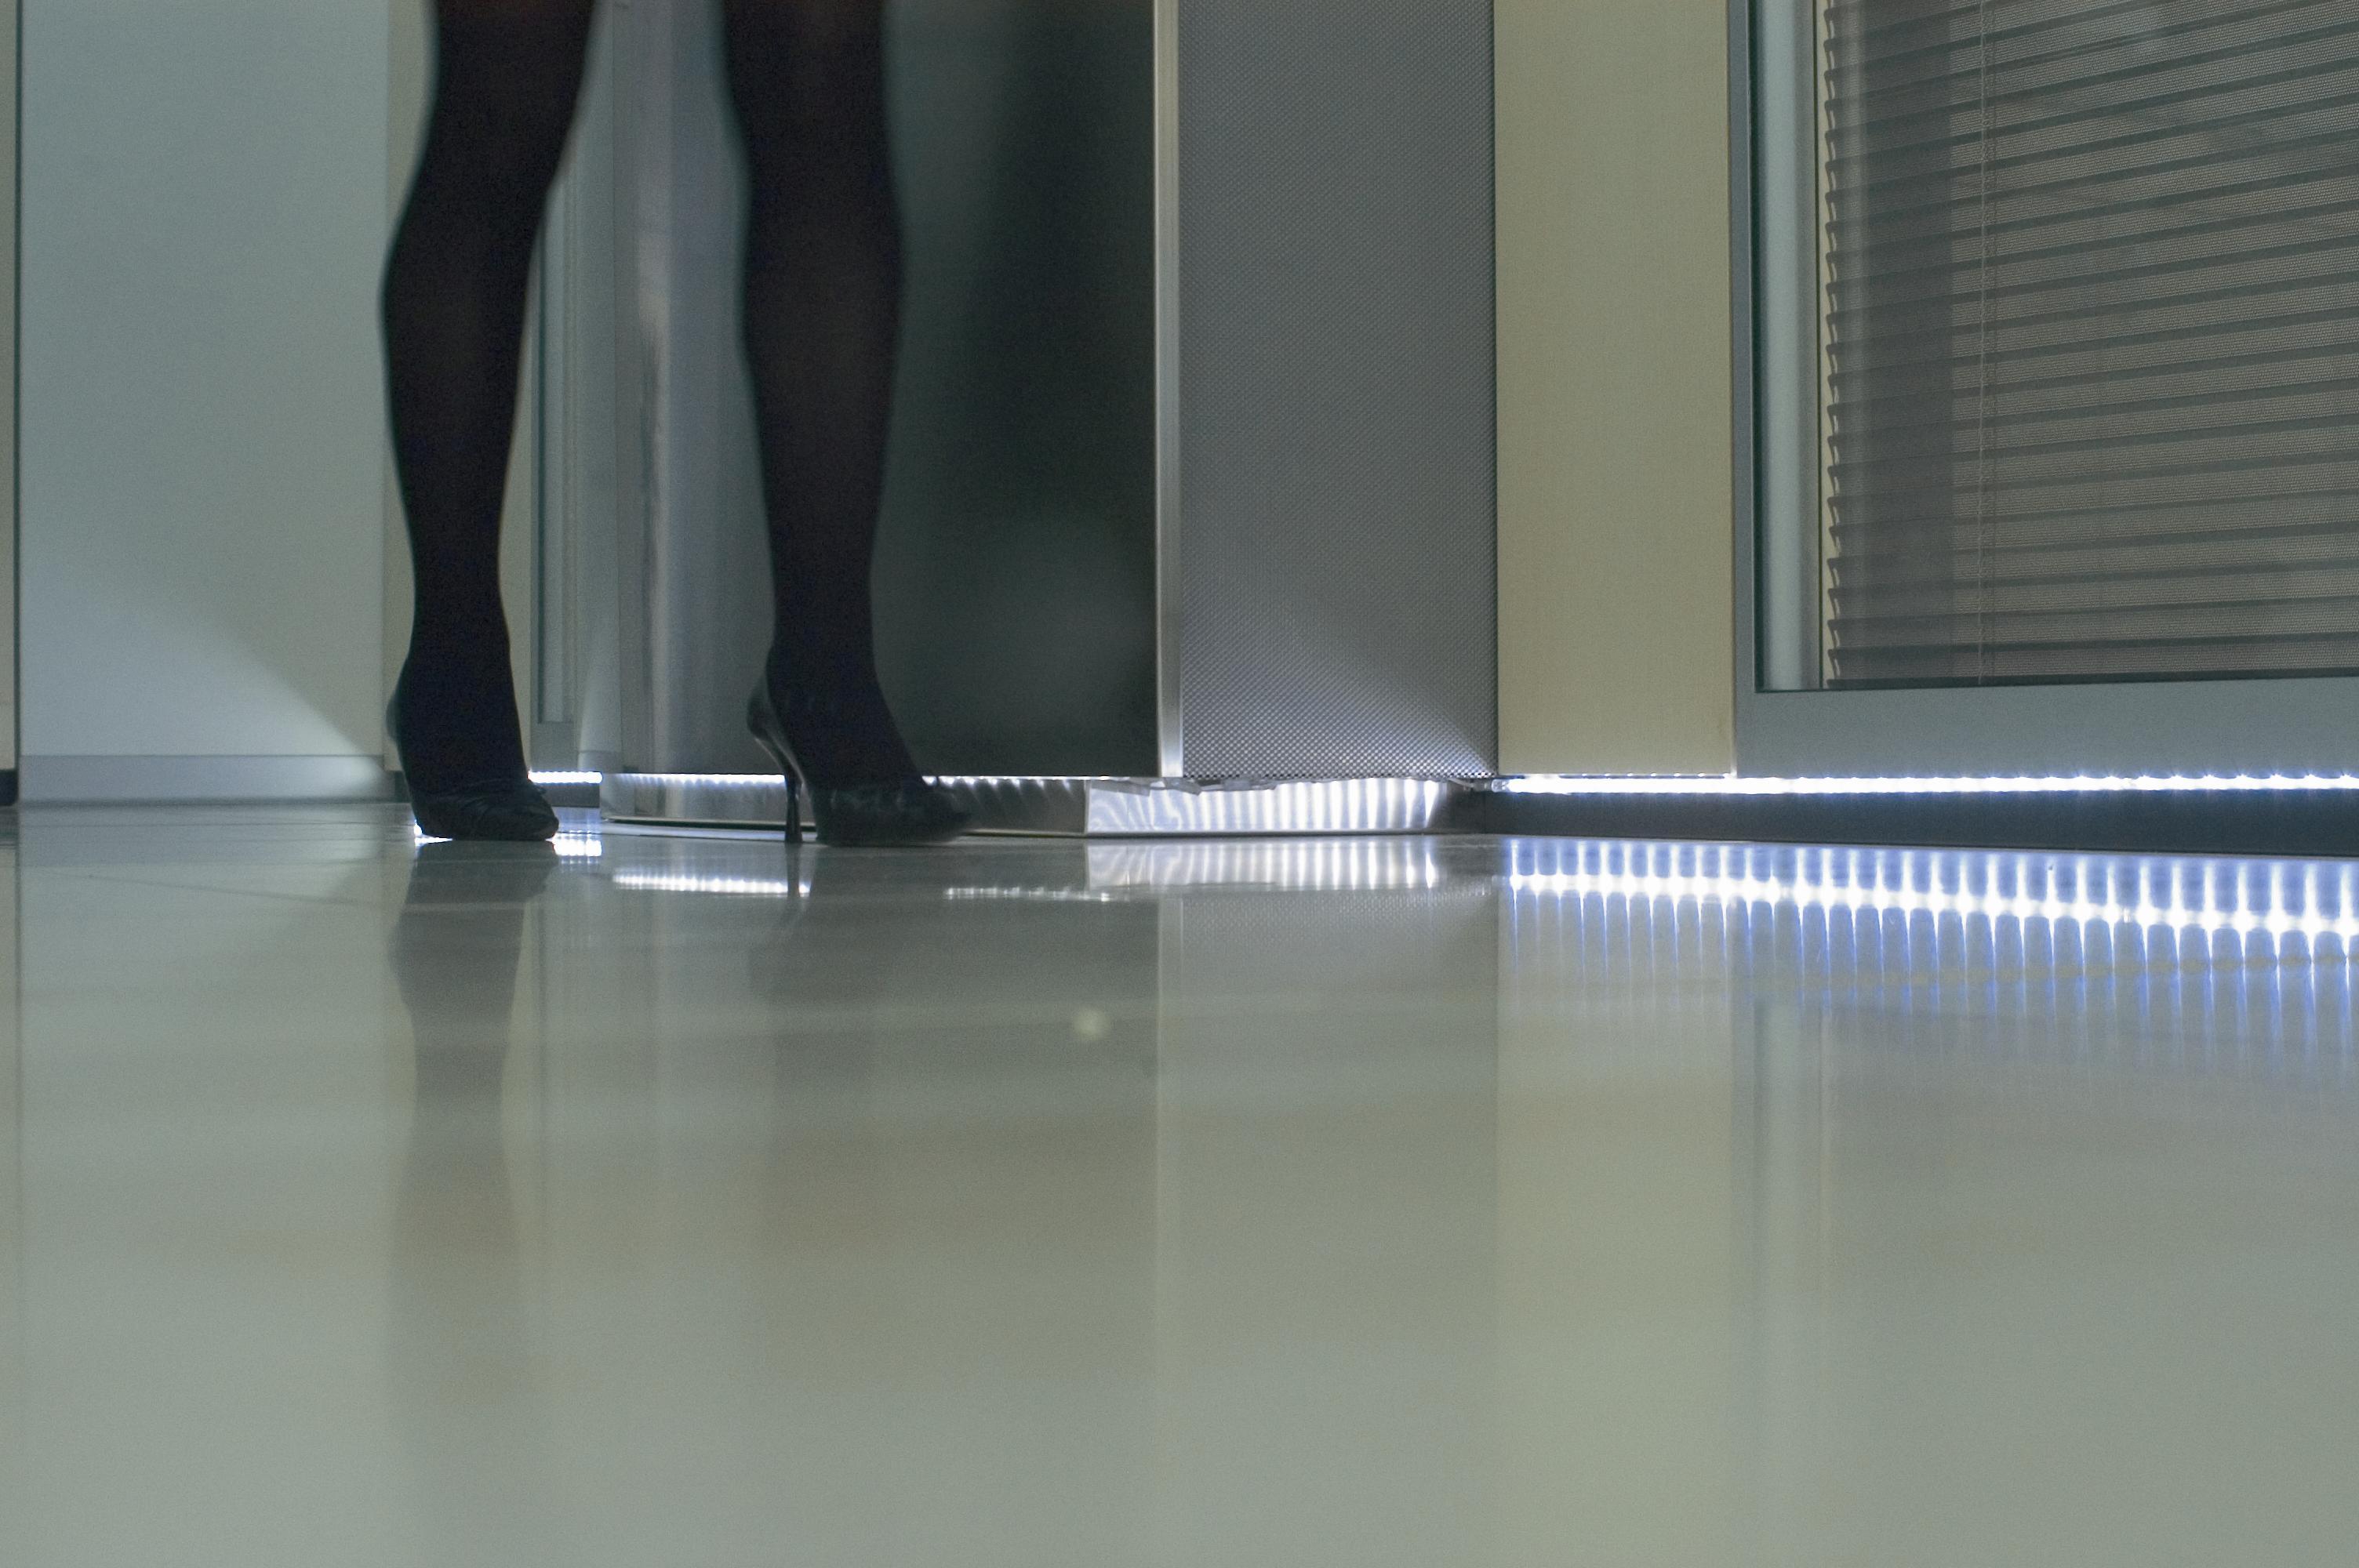 verlichting tegel vloer verlichting